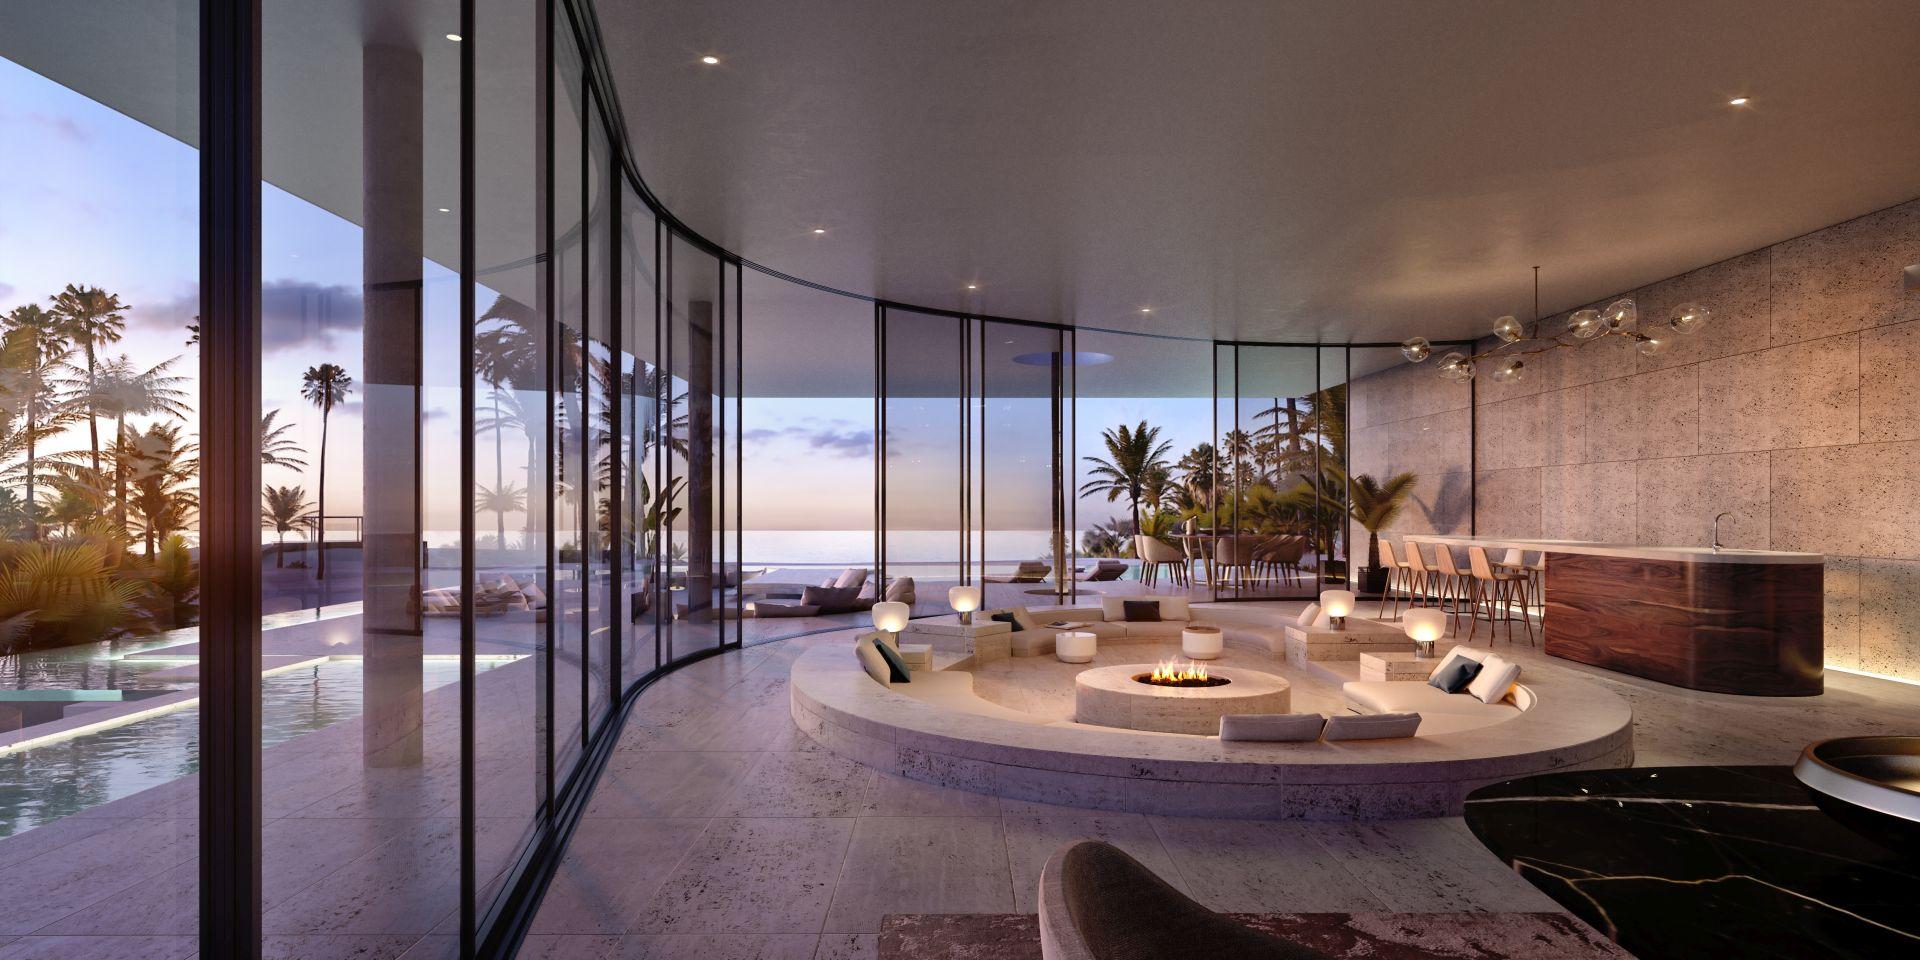 Four Seasons Resort Quot Costa Palmas Quot At Los Cabos Mexico Xoio